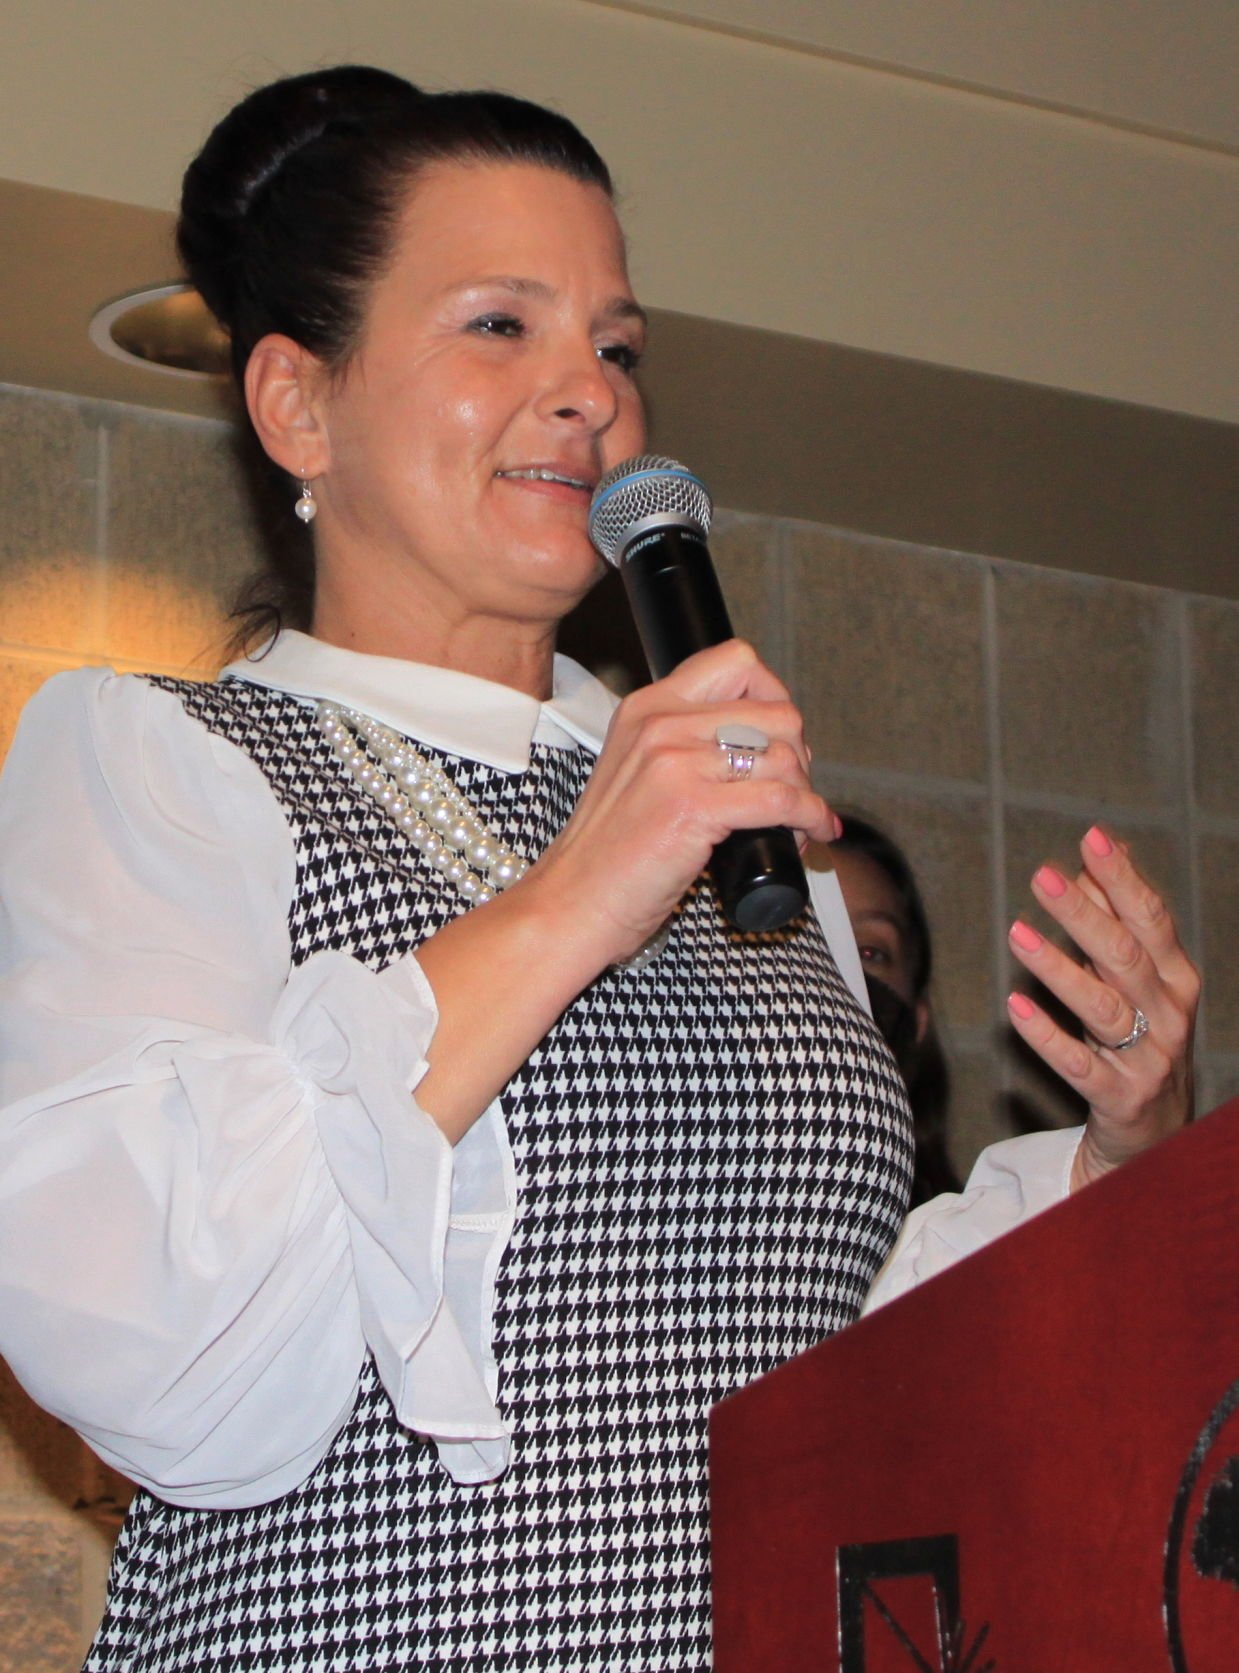 Hearten House Gospel Rescue Mission executive director Marisa McKenzie